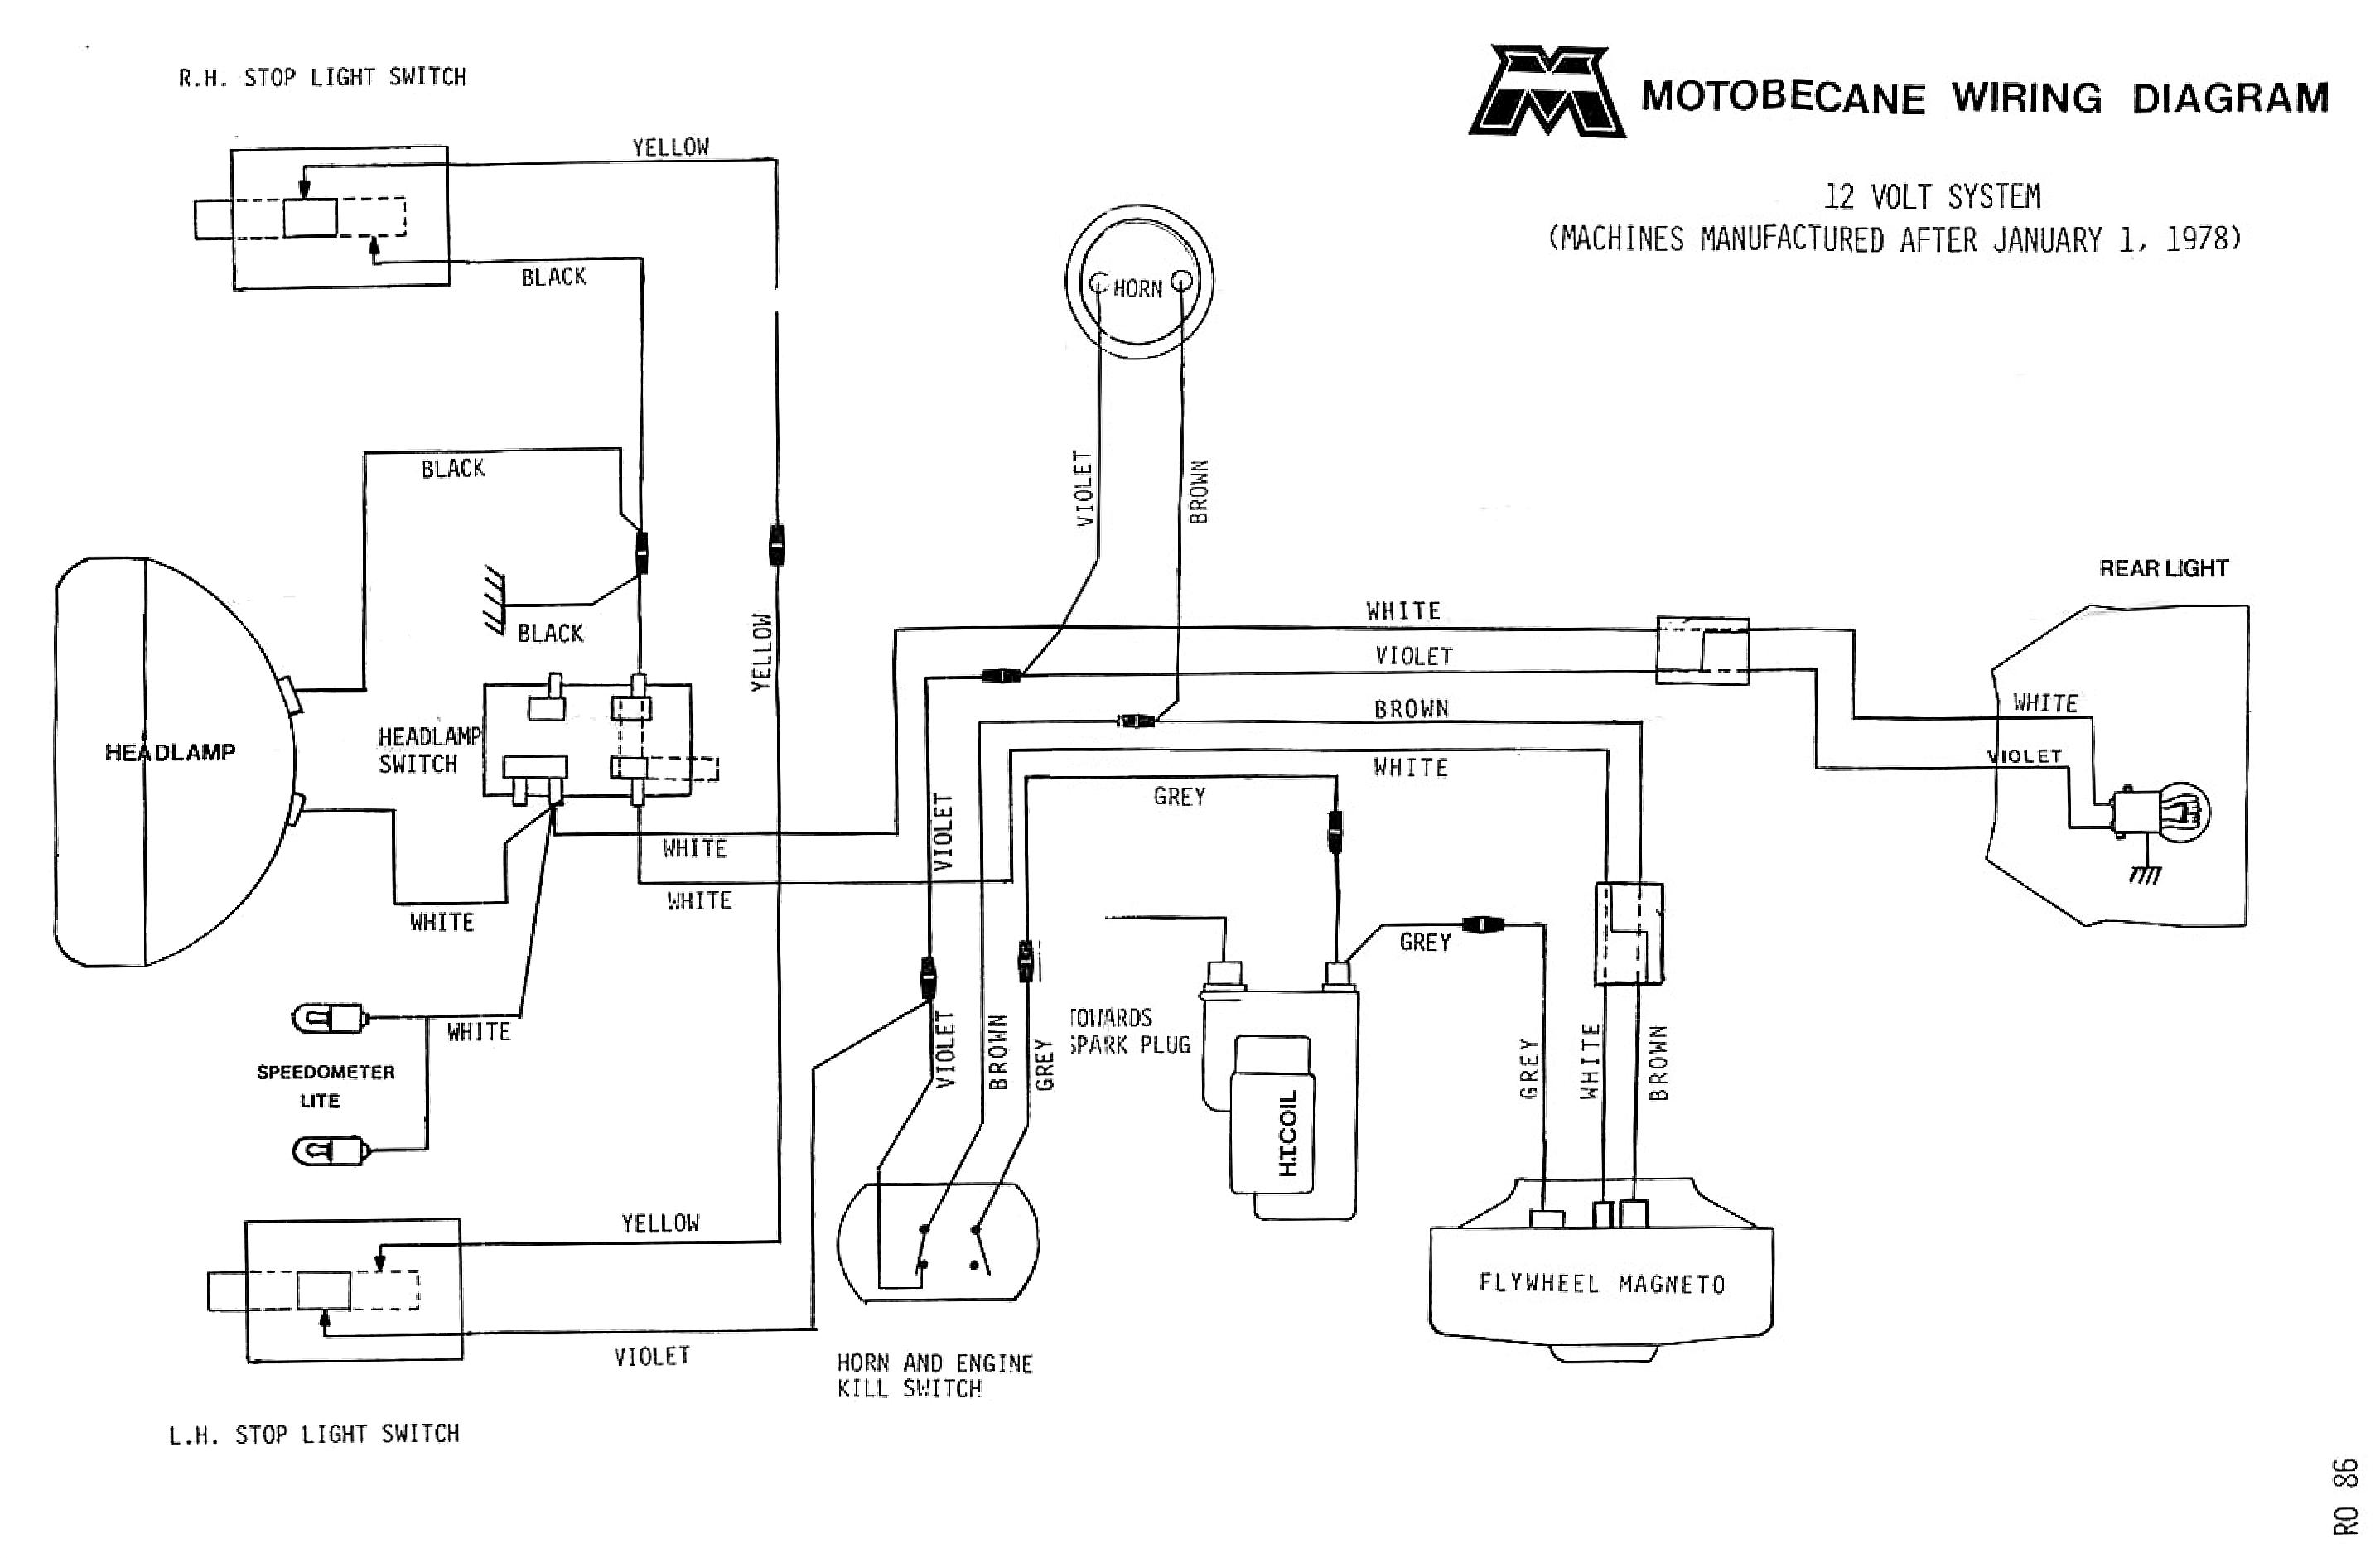 medium resolution of motobecane wiring diagrams mopedwiki mopeds wire diagram motobecane wiring diagrams mopedwiki